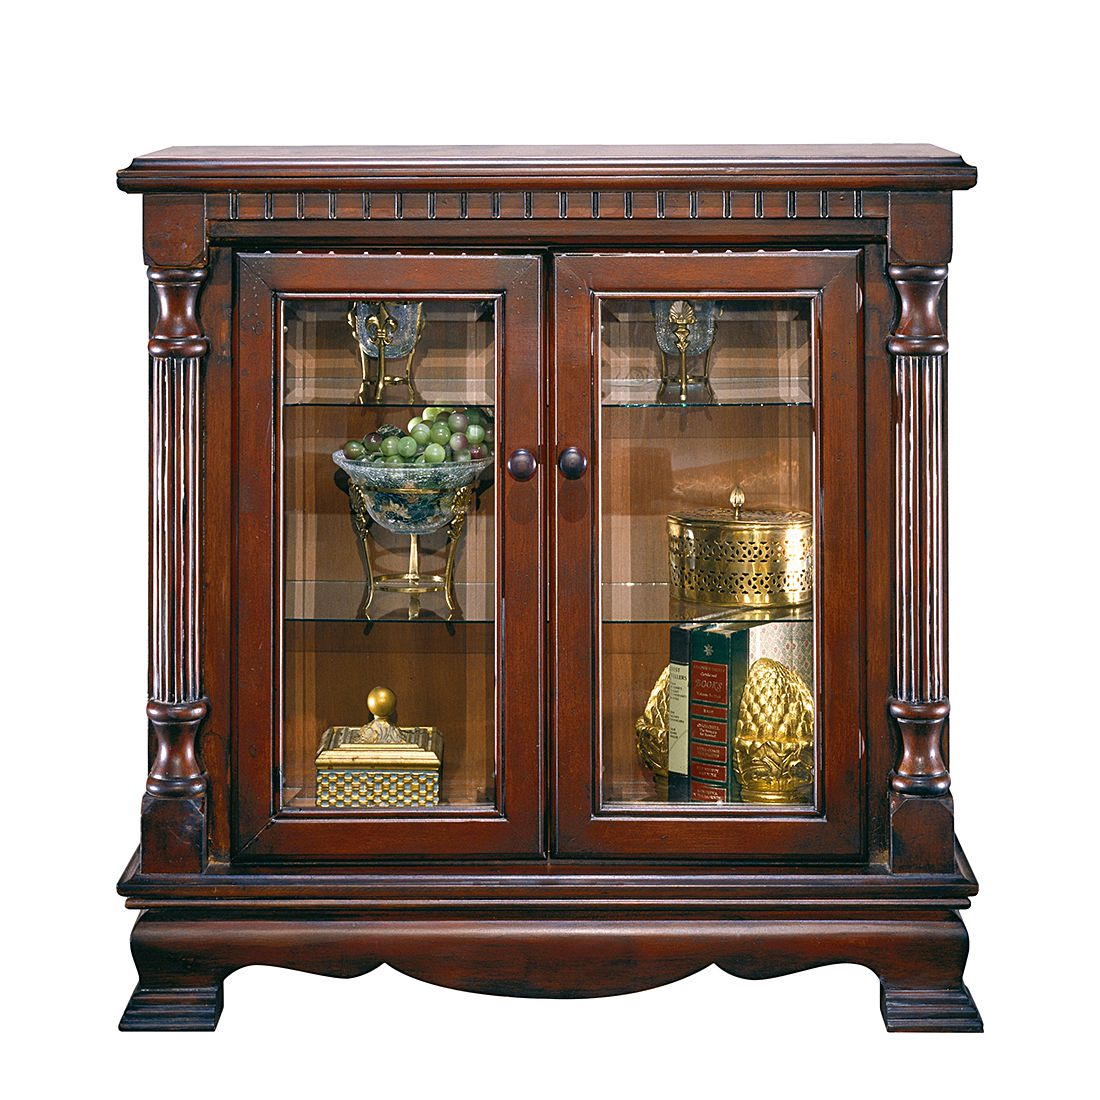 preisvergleich eu vitrine nussbaum. Black Bedroom Furniture Sets. Home Design Ideas